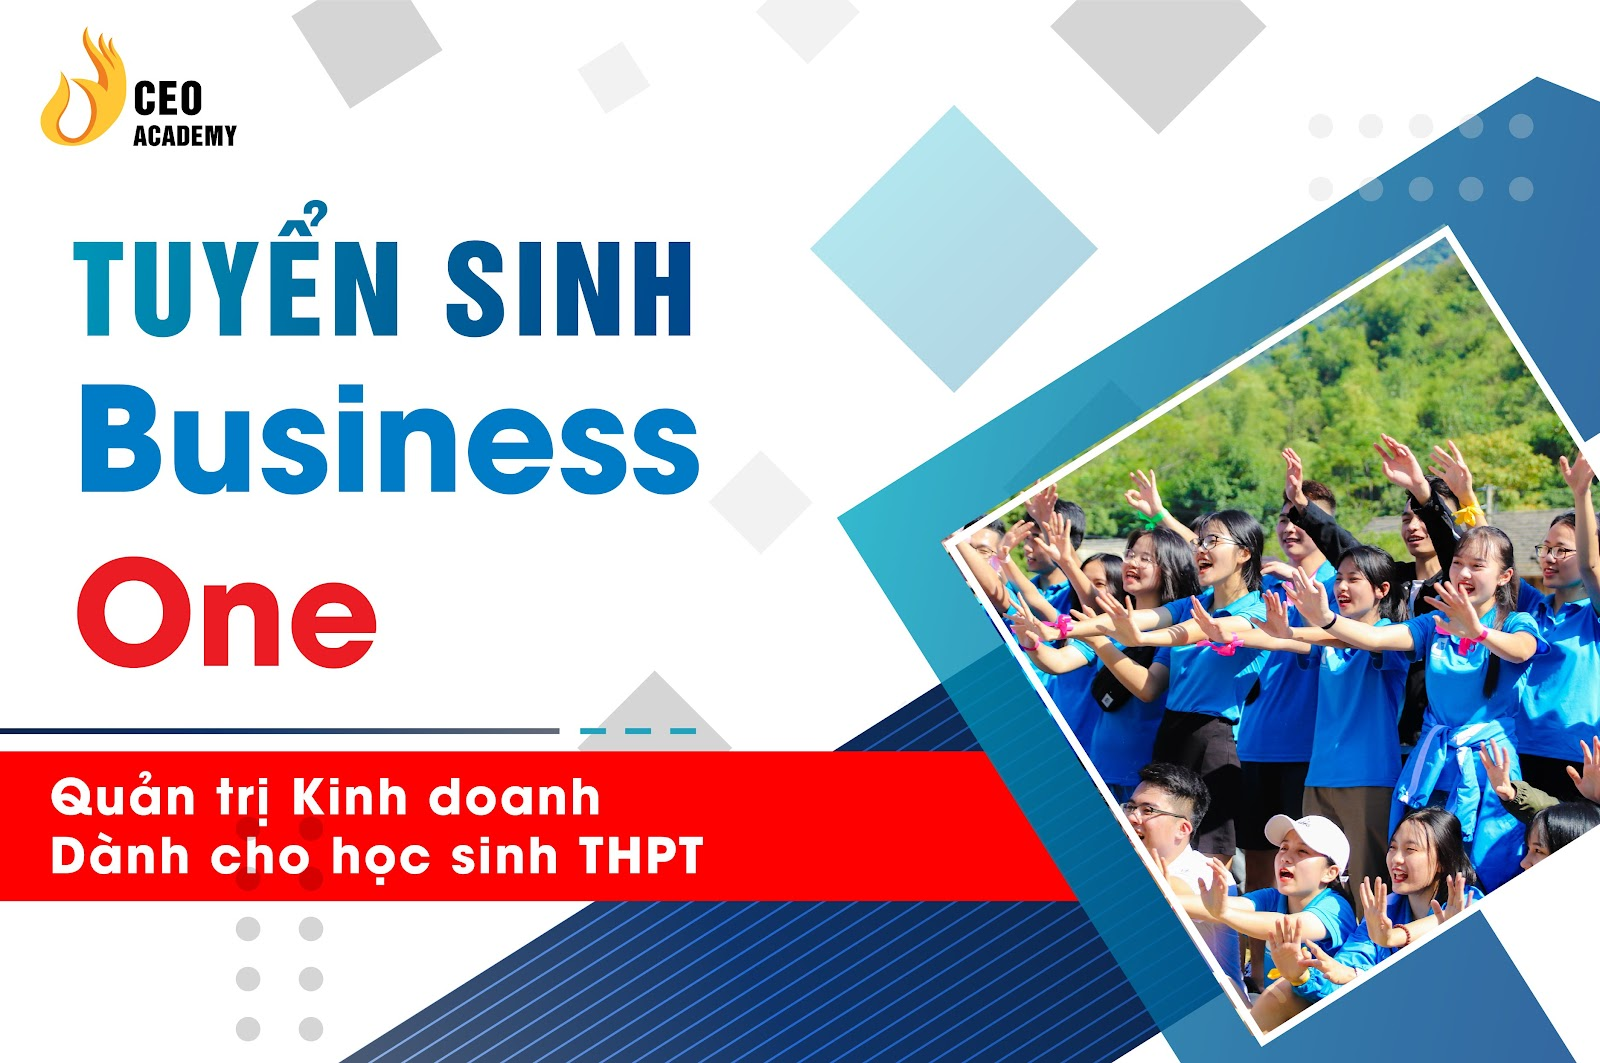 quan-tri-kinh-doanh-business-one